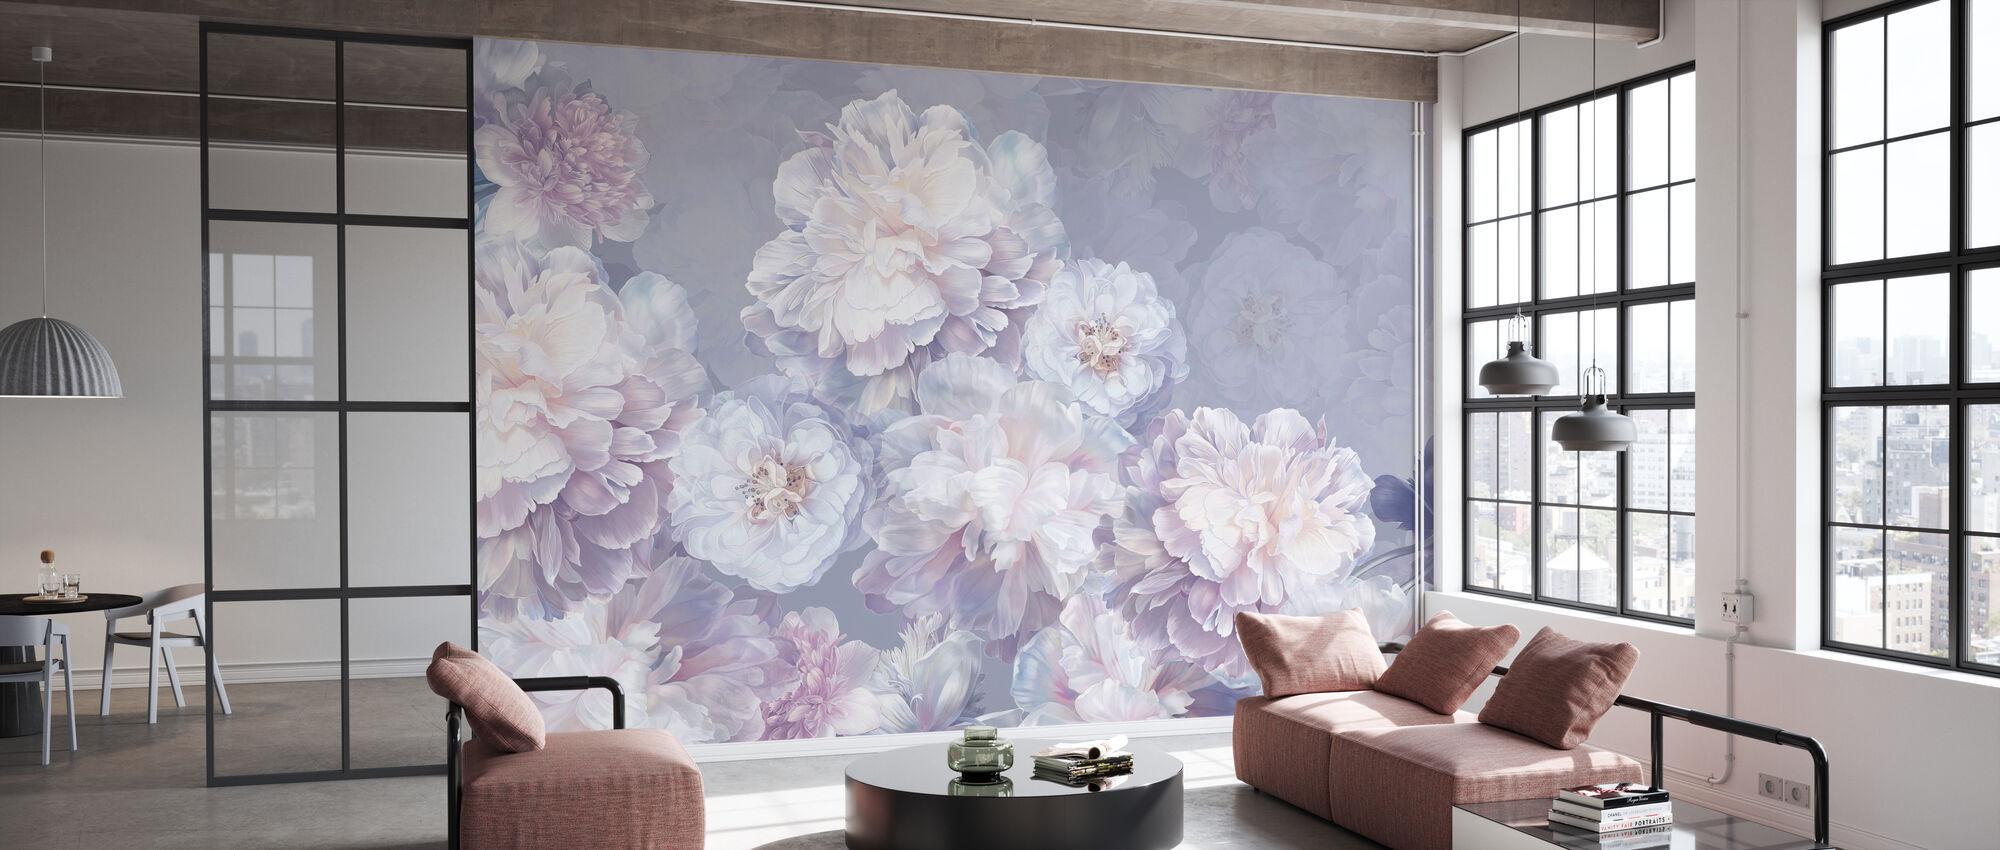 Blossom Essie - Wallpaper - Office